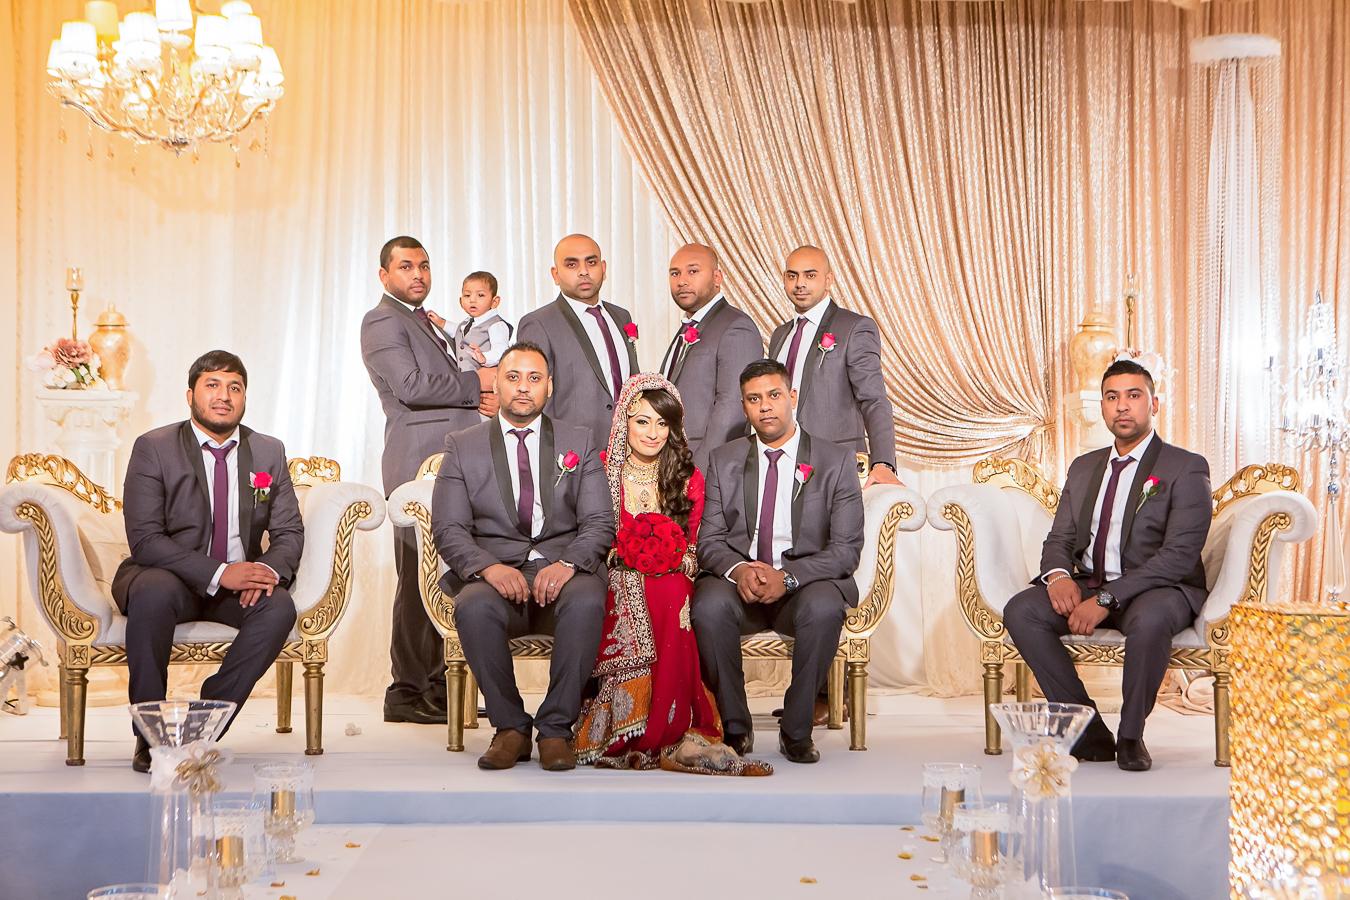 Nasir and Minara wedding at The Sheridan suite Macnchester Didsbury Opu Sultan Photography Manchester and Edinburgh Asian Muslim Hindu Sikh-45.jpg